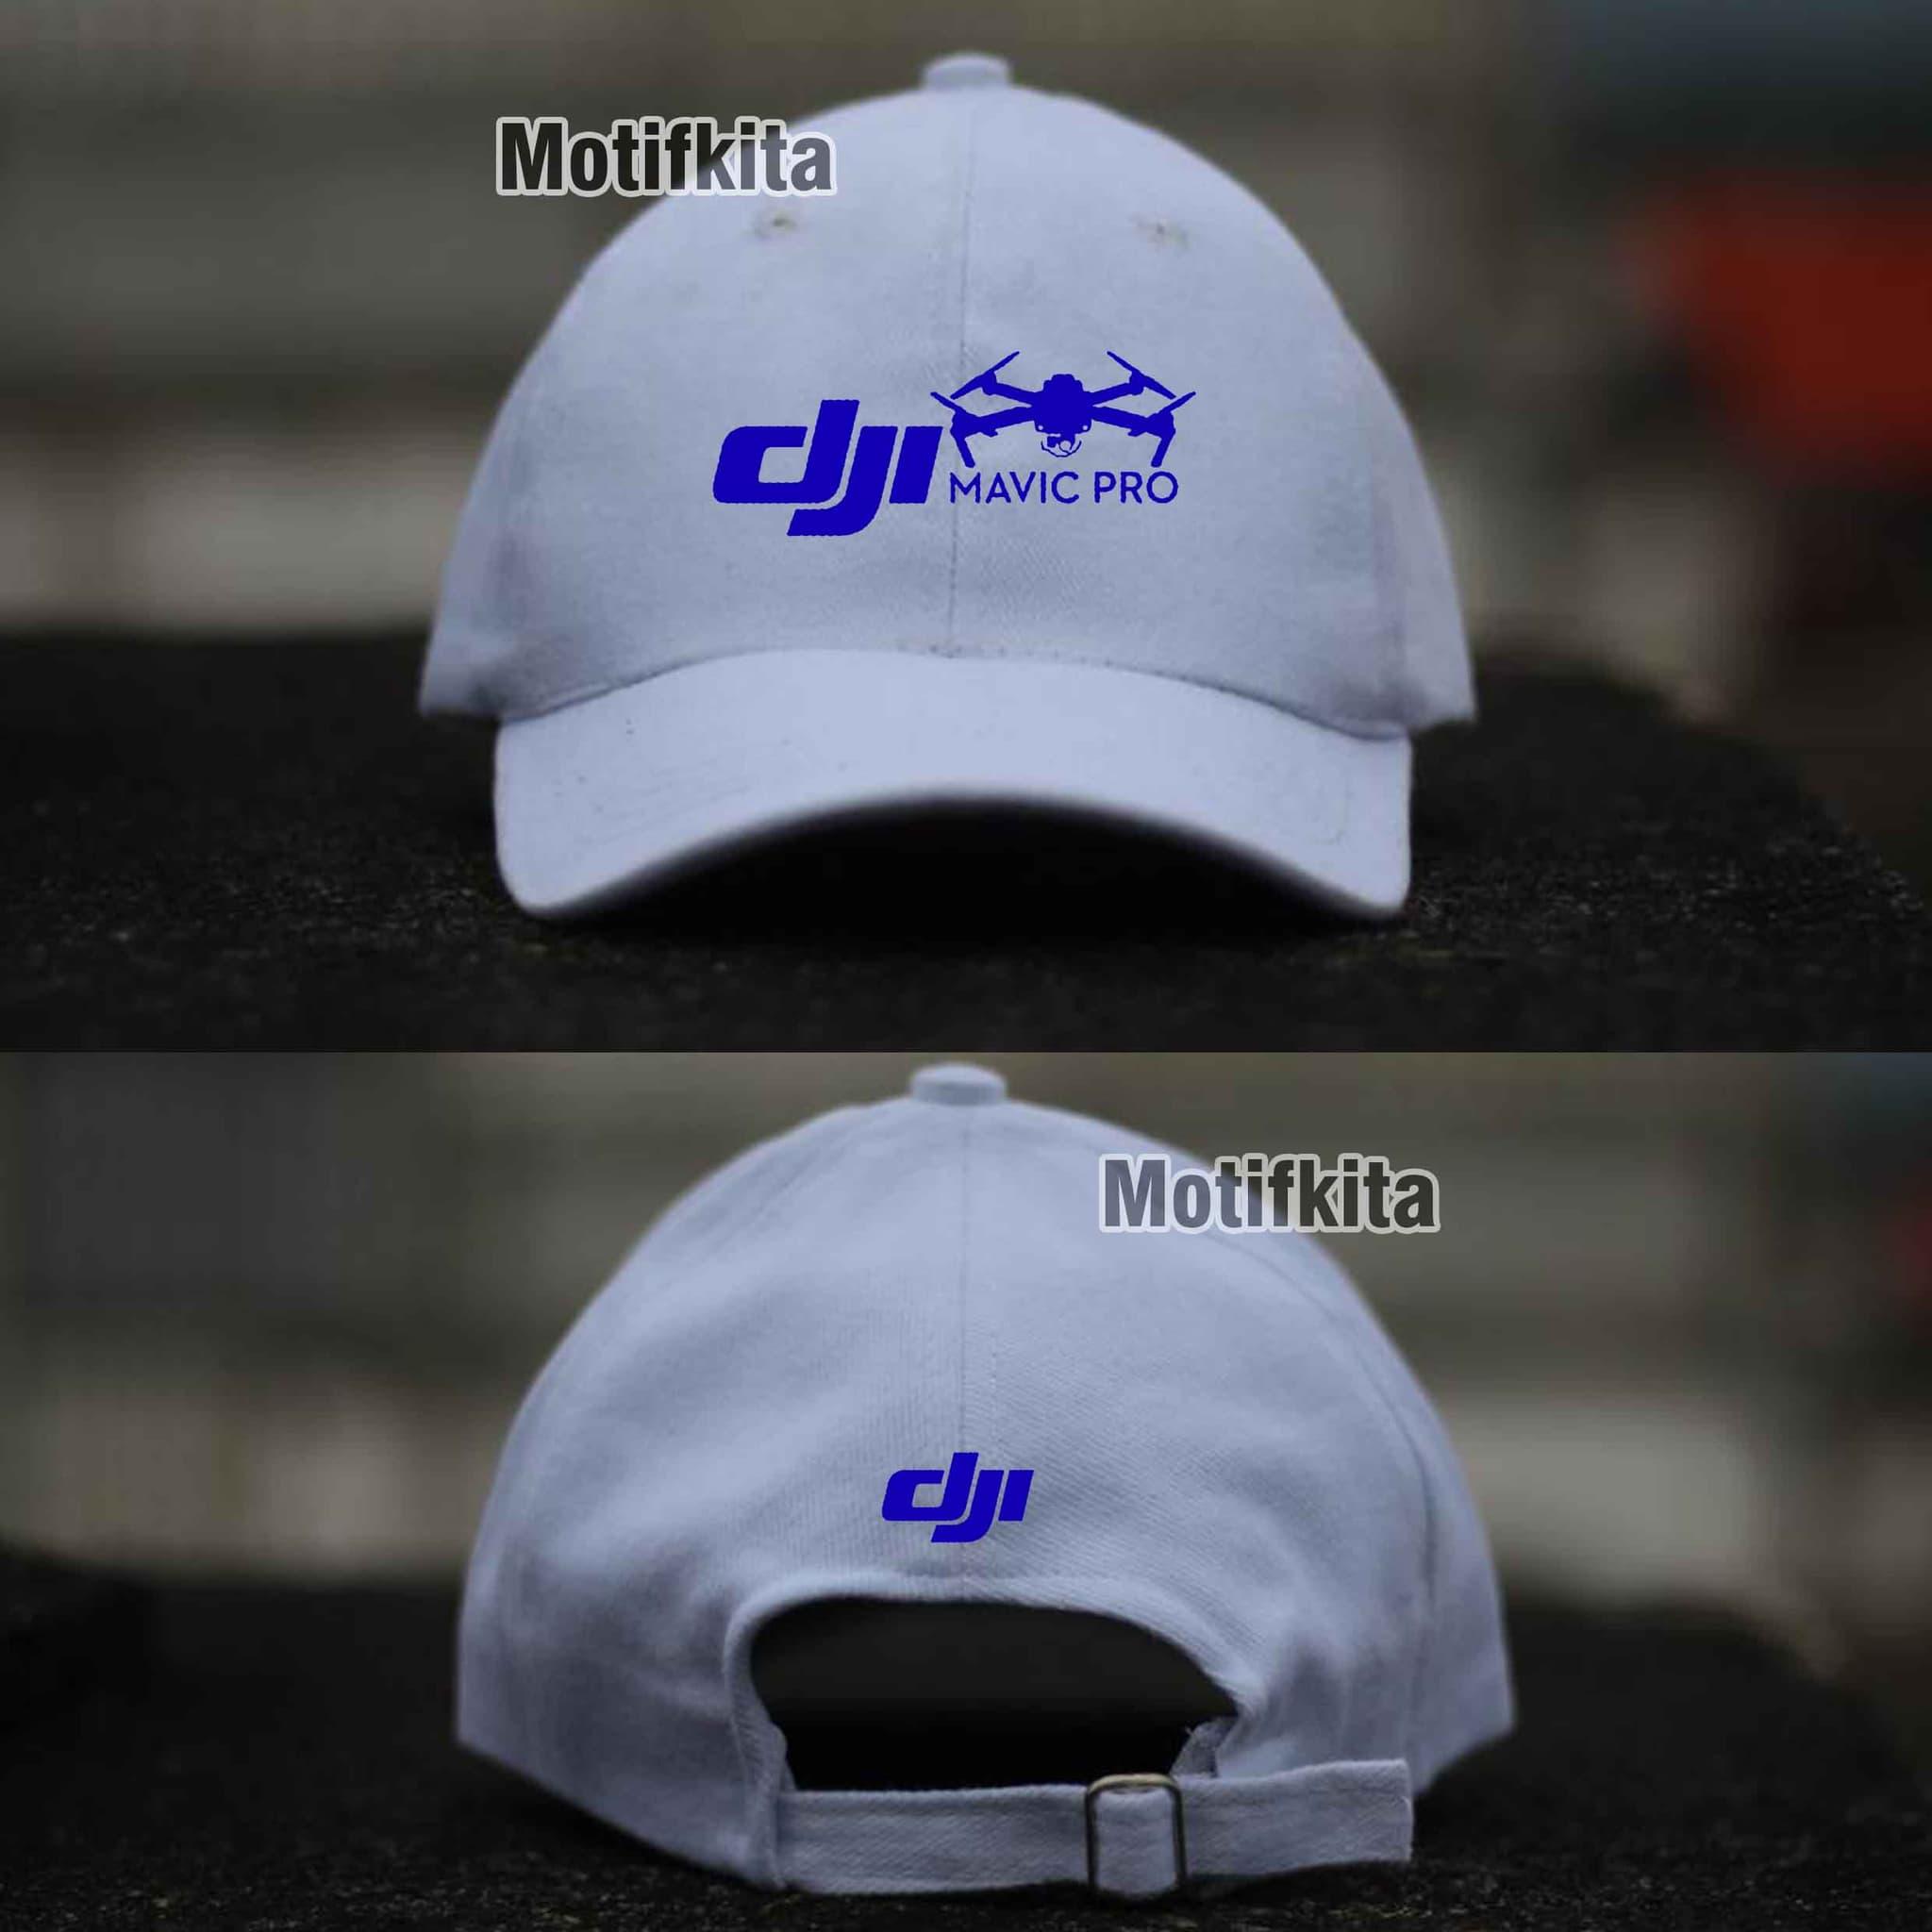 PENAWARAN Topi Baseball DJI MAVIC PRO putih keren Costumerch d69bffee36